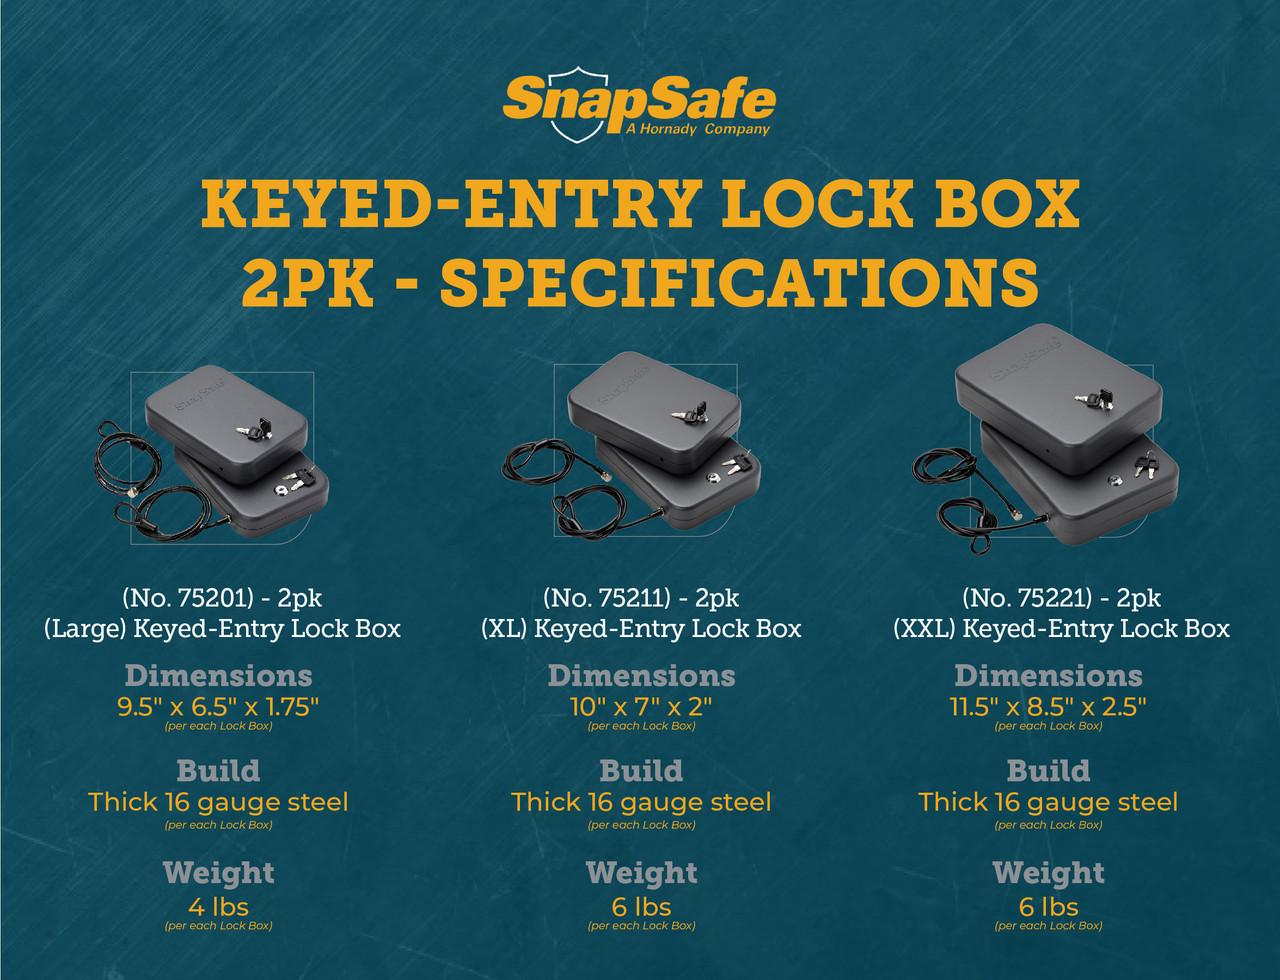 https://d3d71ba2asa5oz.cloudfront.net/23000296/images/snapsafe-2-pack-keyed-alike-large-lock-boxes-casku18175-2.jpg